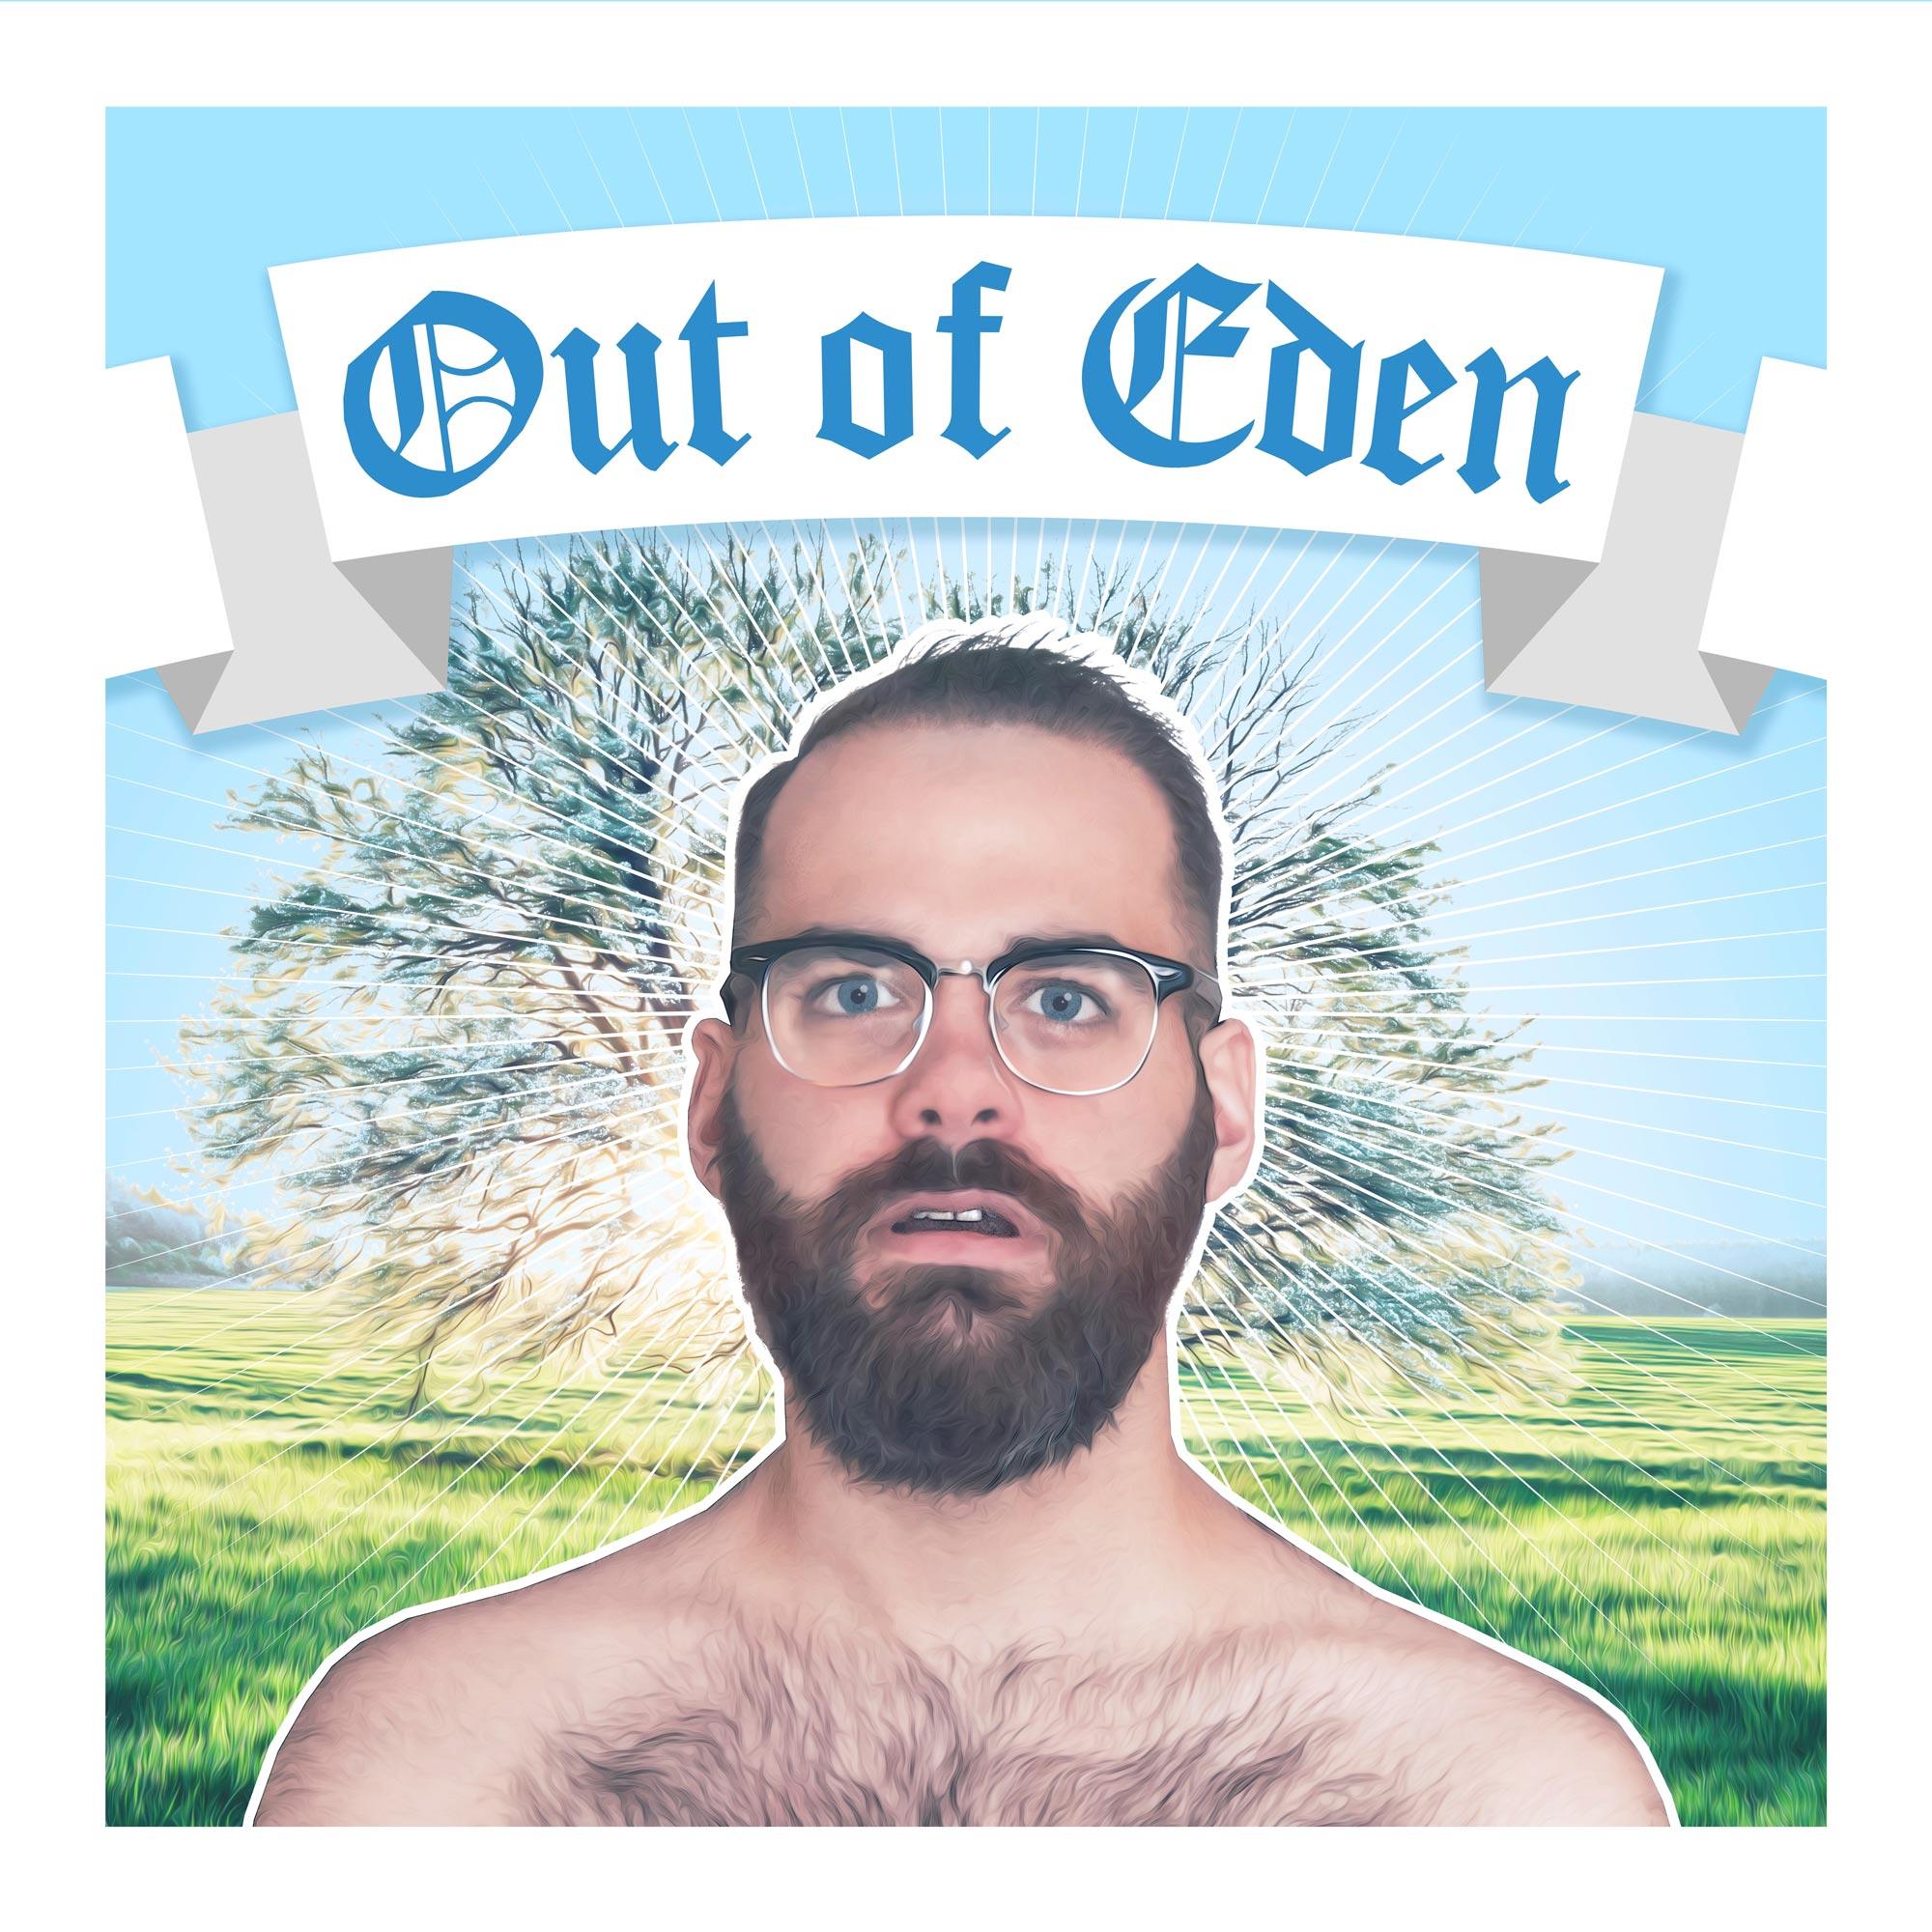 ICloud Blake Eden naked (36 photo), Topless, Paparazzi, Selfie, butt 2015